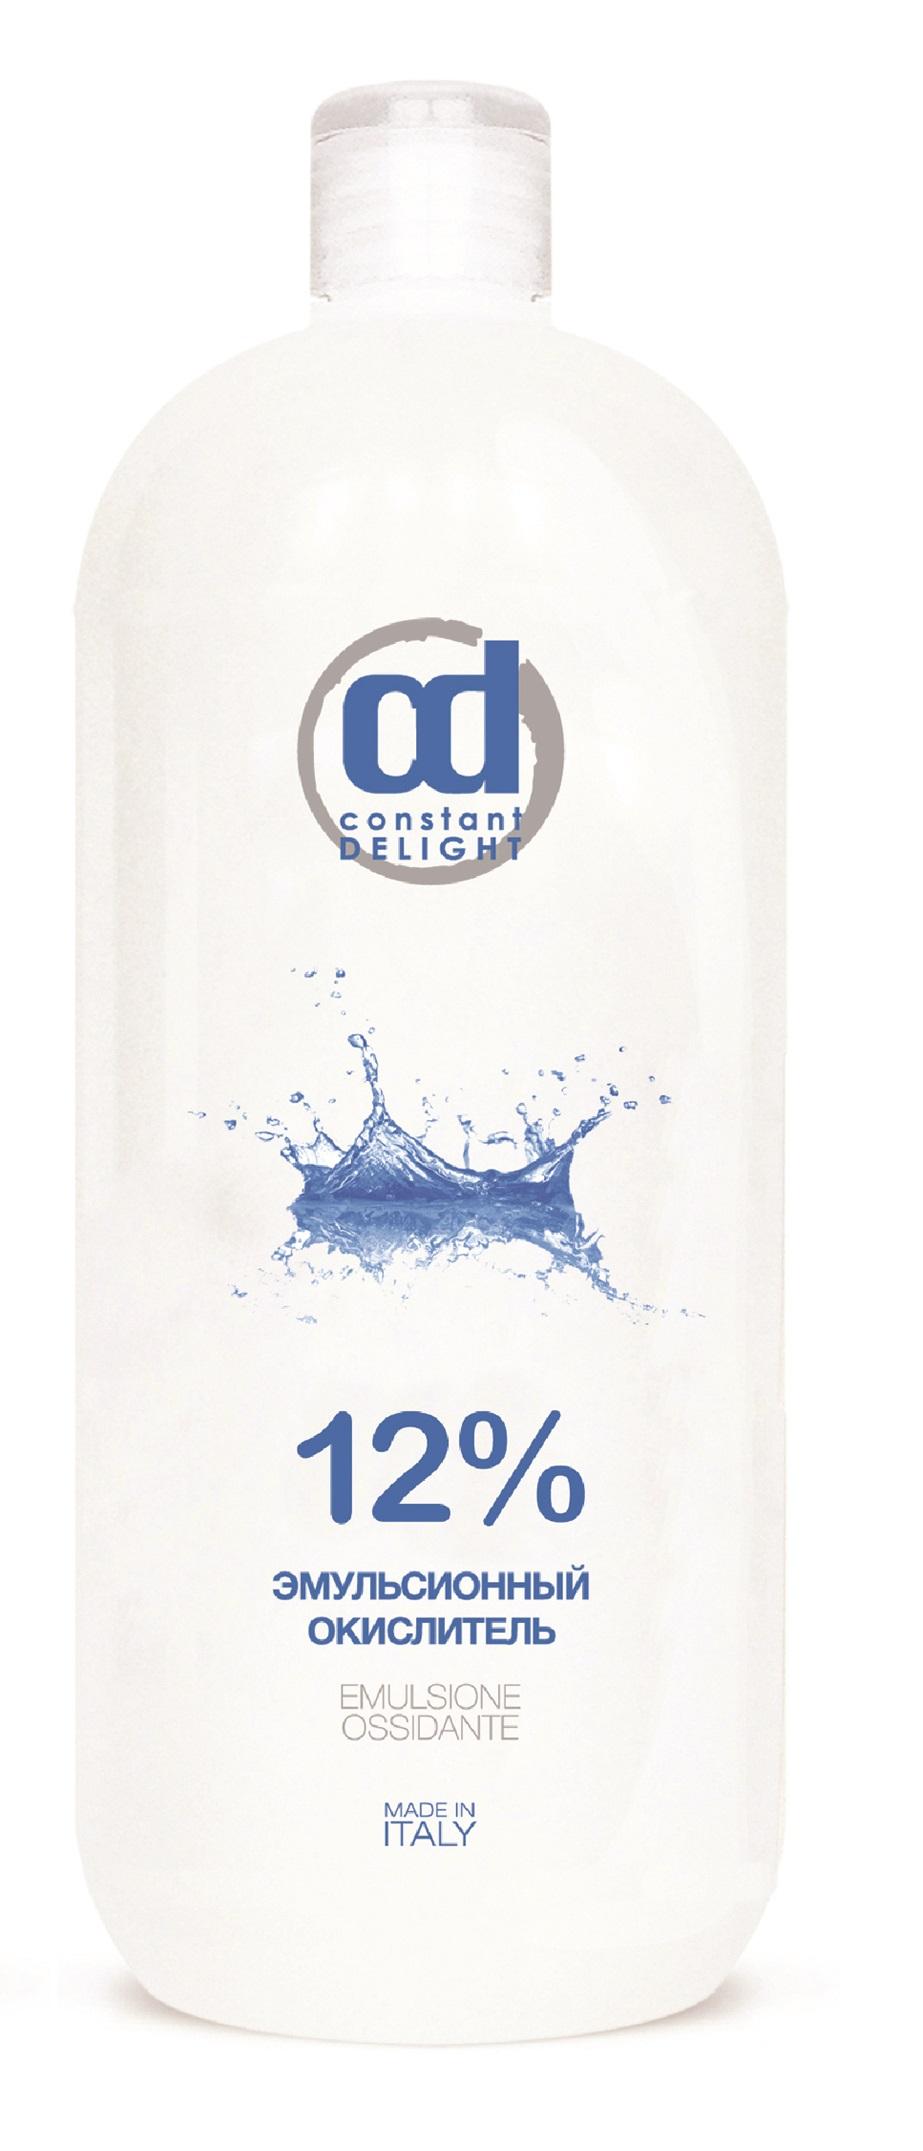 CONSTANT DELIGHT Окислитель эмульсионный 12% белый / Oxigent, 1000 мл